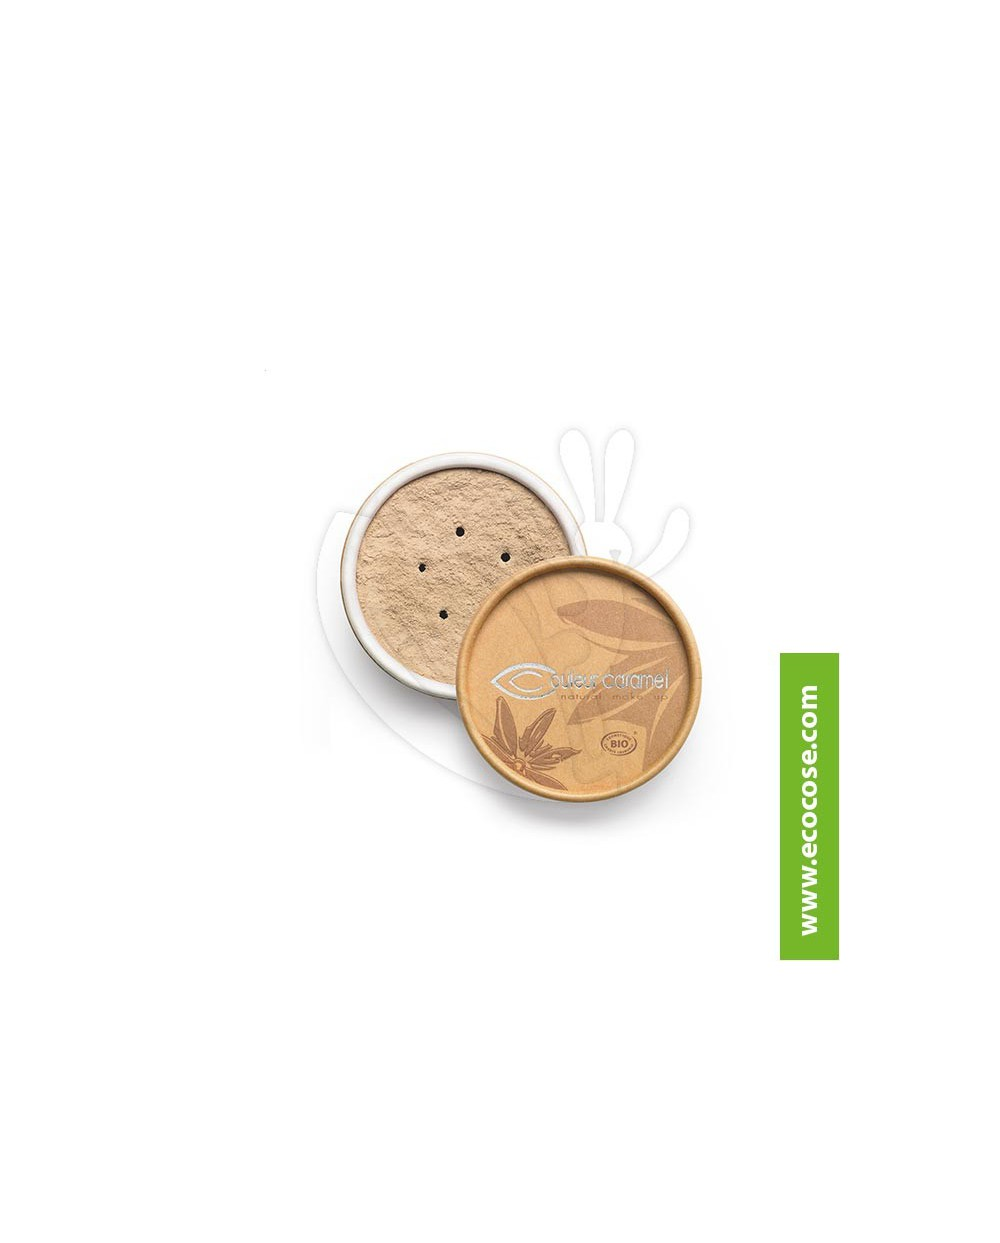 Couleur Caramel - Fondotinta minerale 01 Beige clair